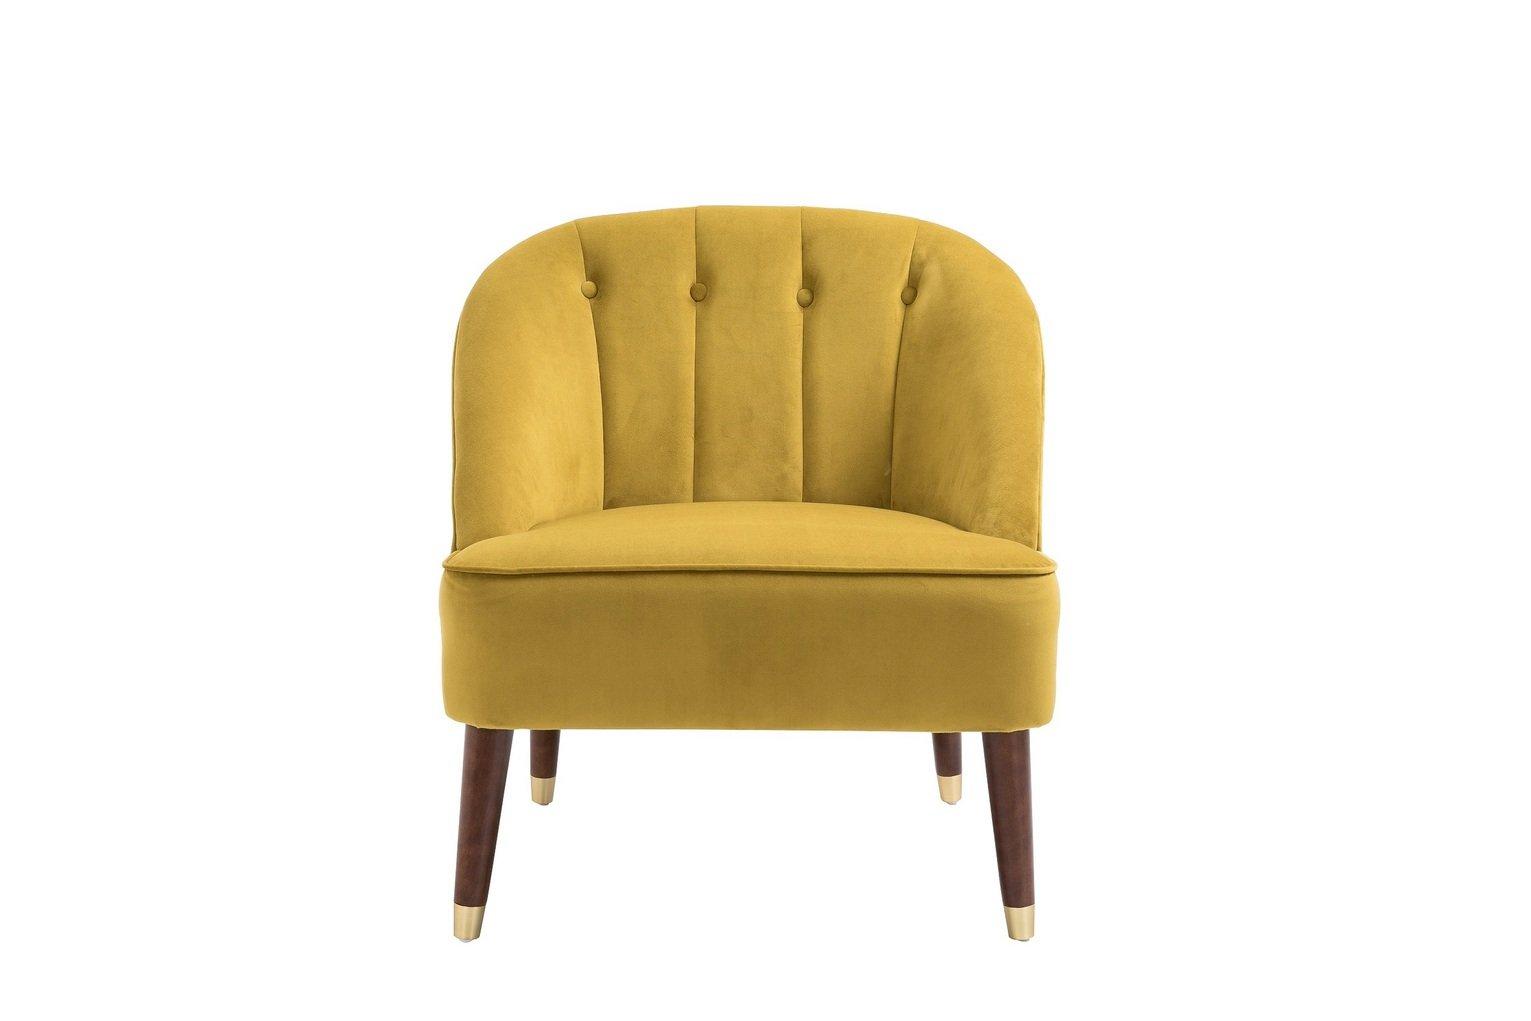 Birlea Alexa Fabric Accent Chair - Mustard